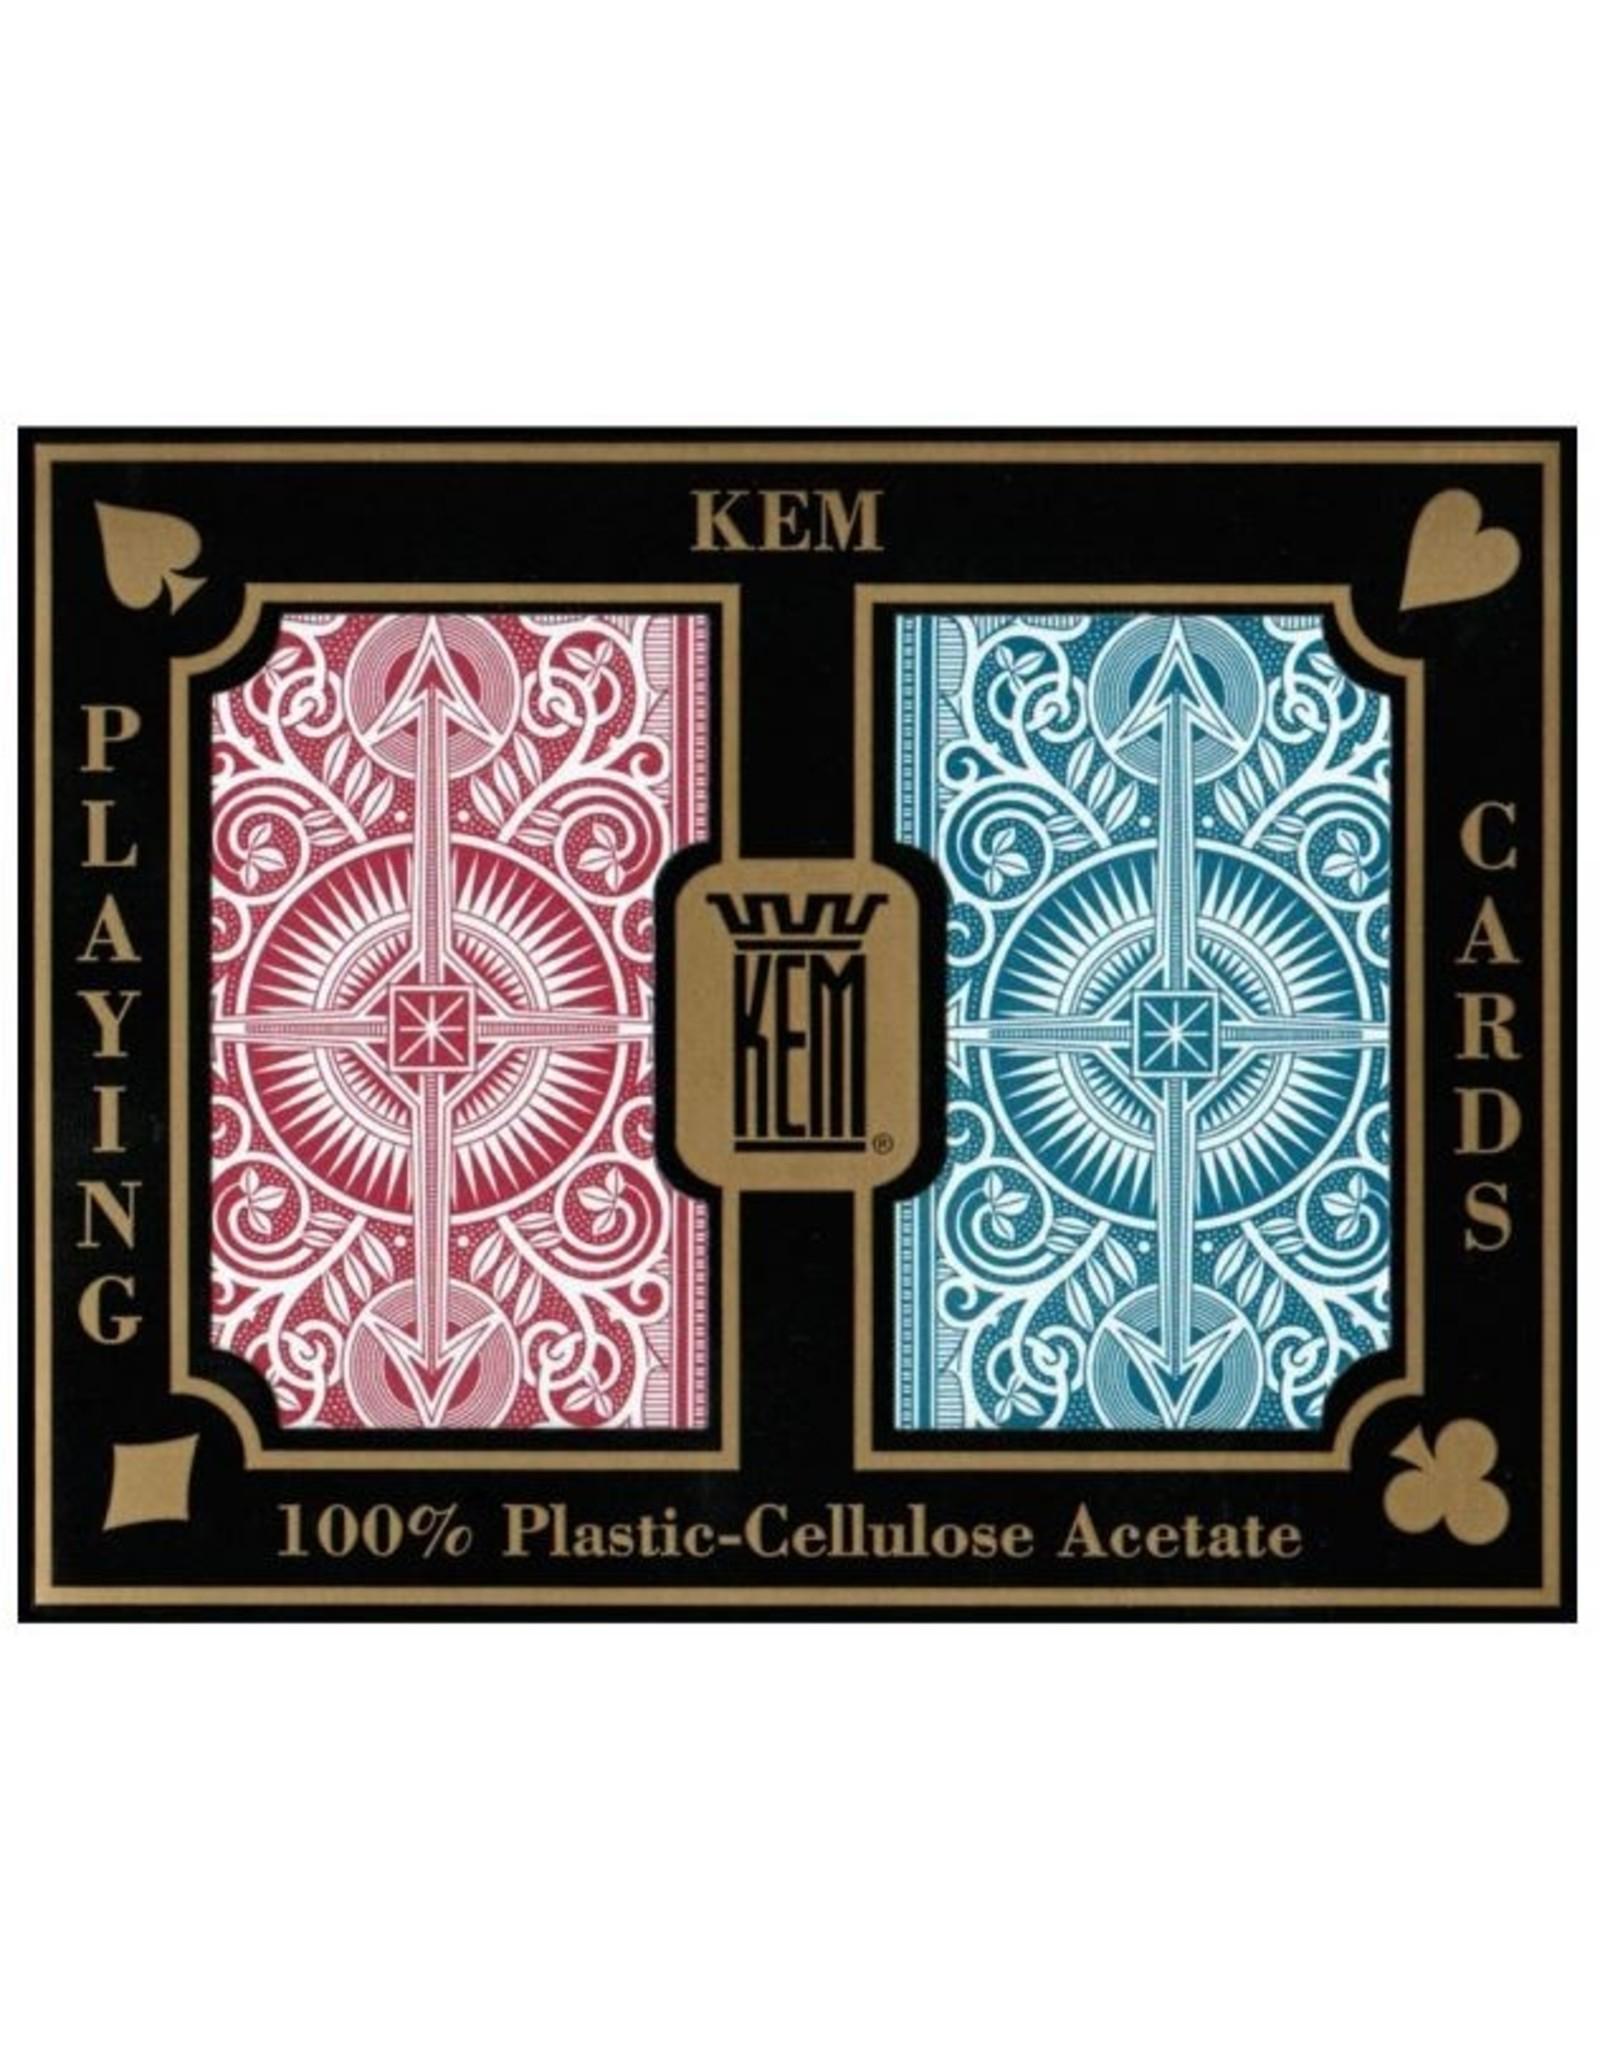 Kem KEM Arrow Plastic Playing Cards